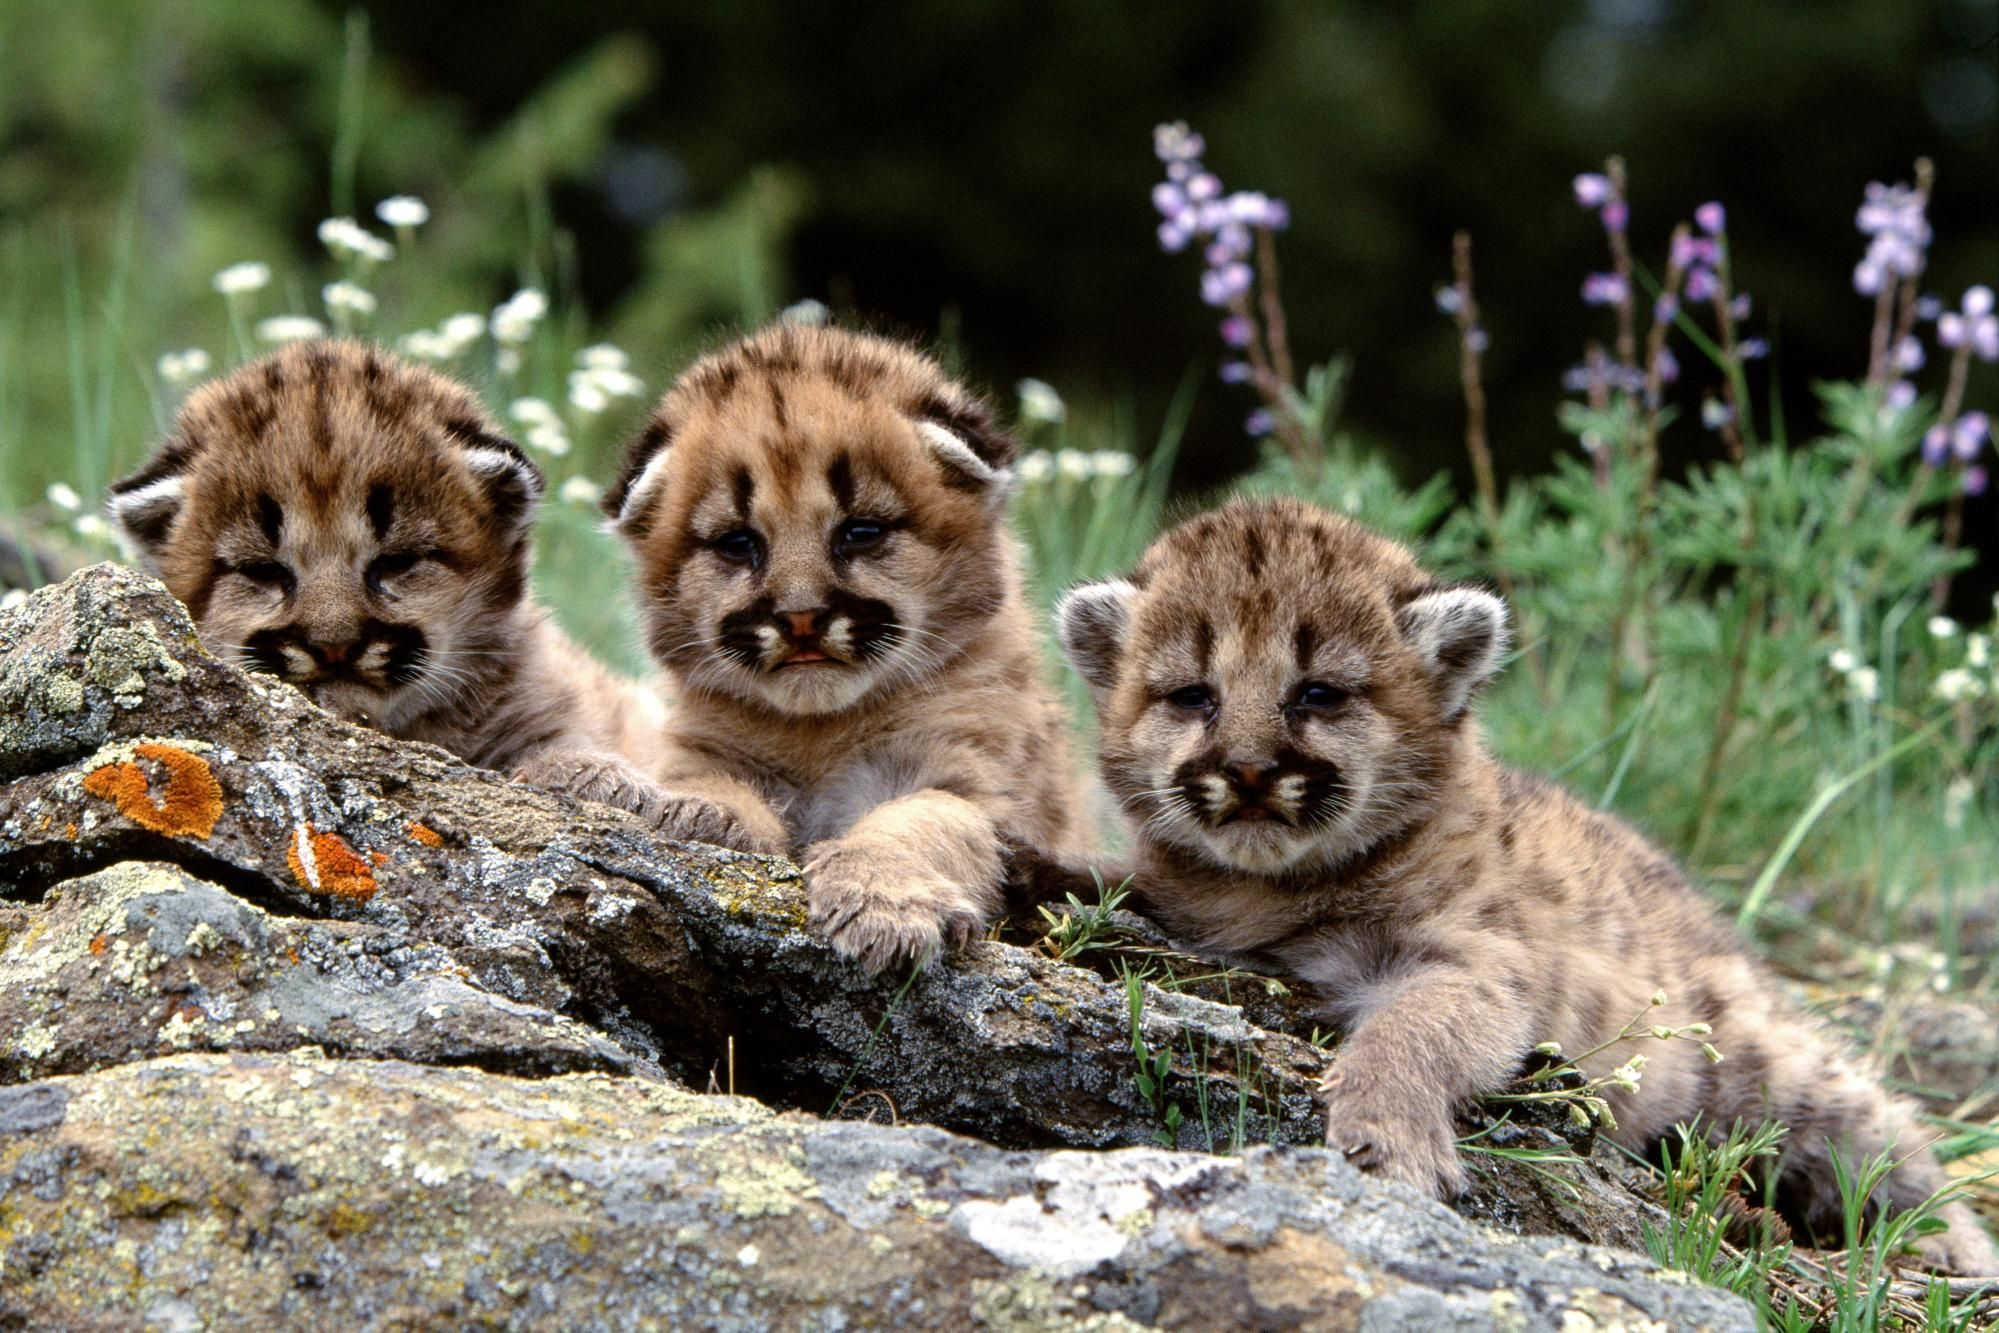 cheetah cubs 1 wallpaper | animals - here kitty kitty | pinterest